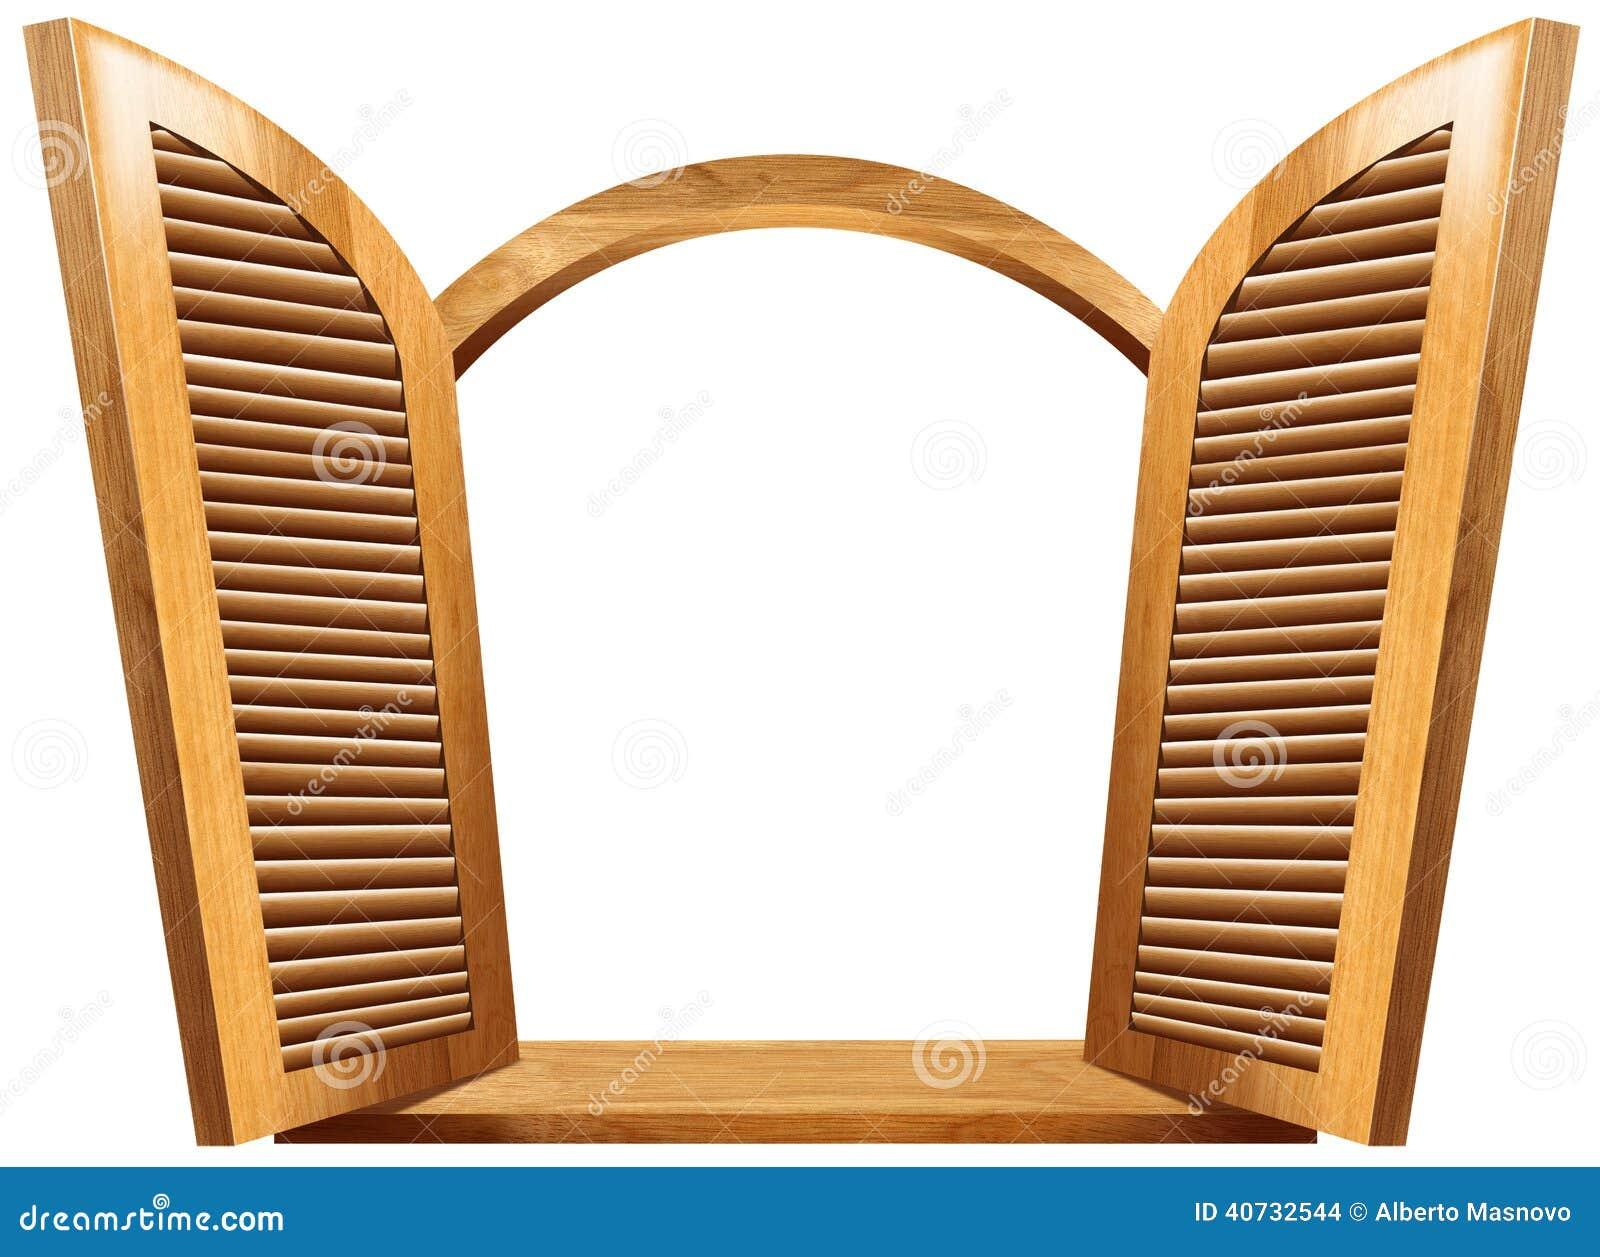 Wooden Open Window